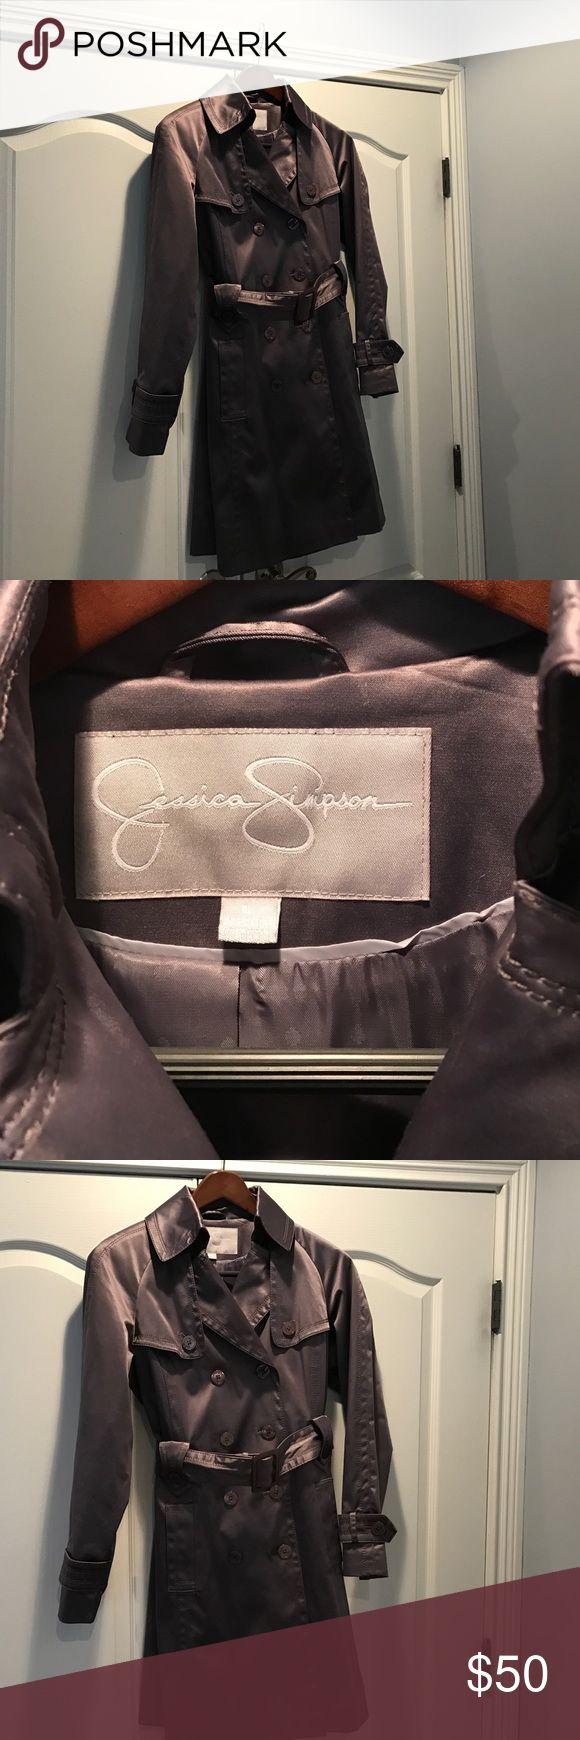 Jessica Simpson - Trenchcoat - Size Large Jessica Simpson - Trenchcoat/Raincoat - Size Large - Slate Gray Jessica Simpson Jackets & Coats Trench Coats